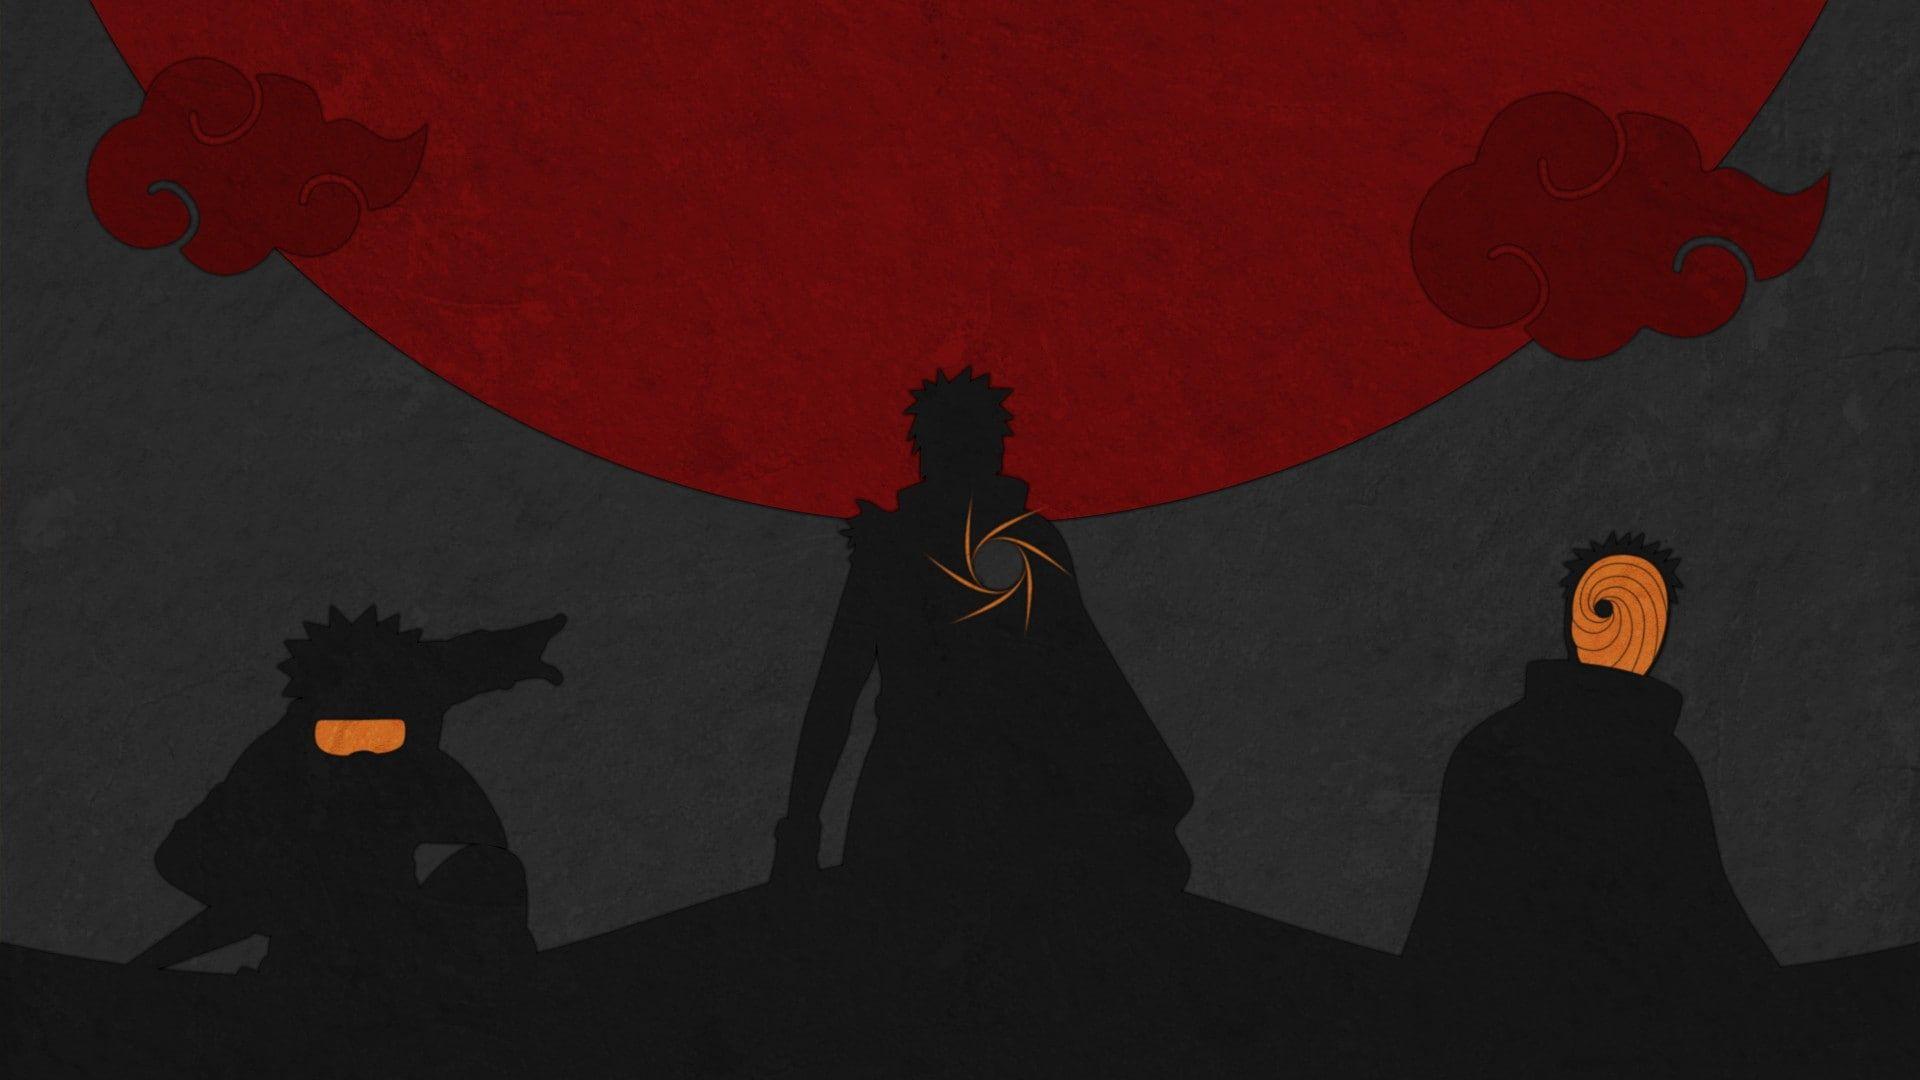 dark silhouette anime Naruto Shippuuden Uchiha Obito